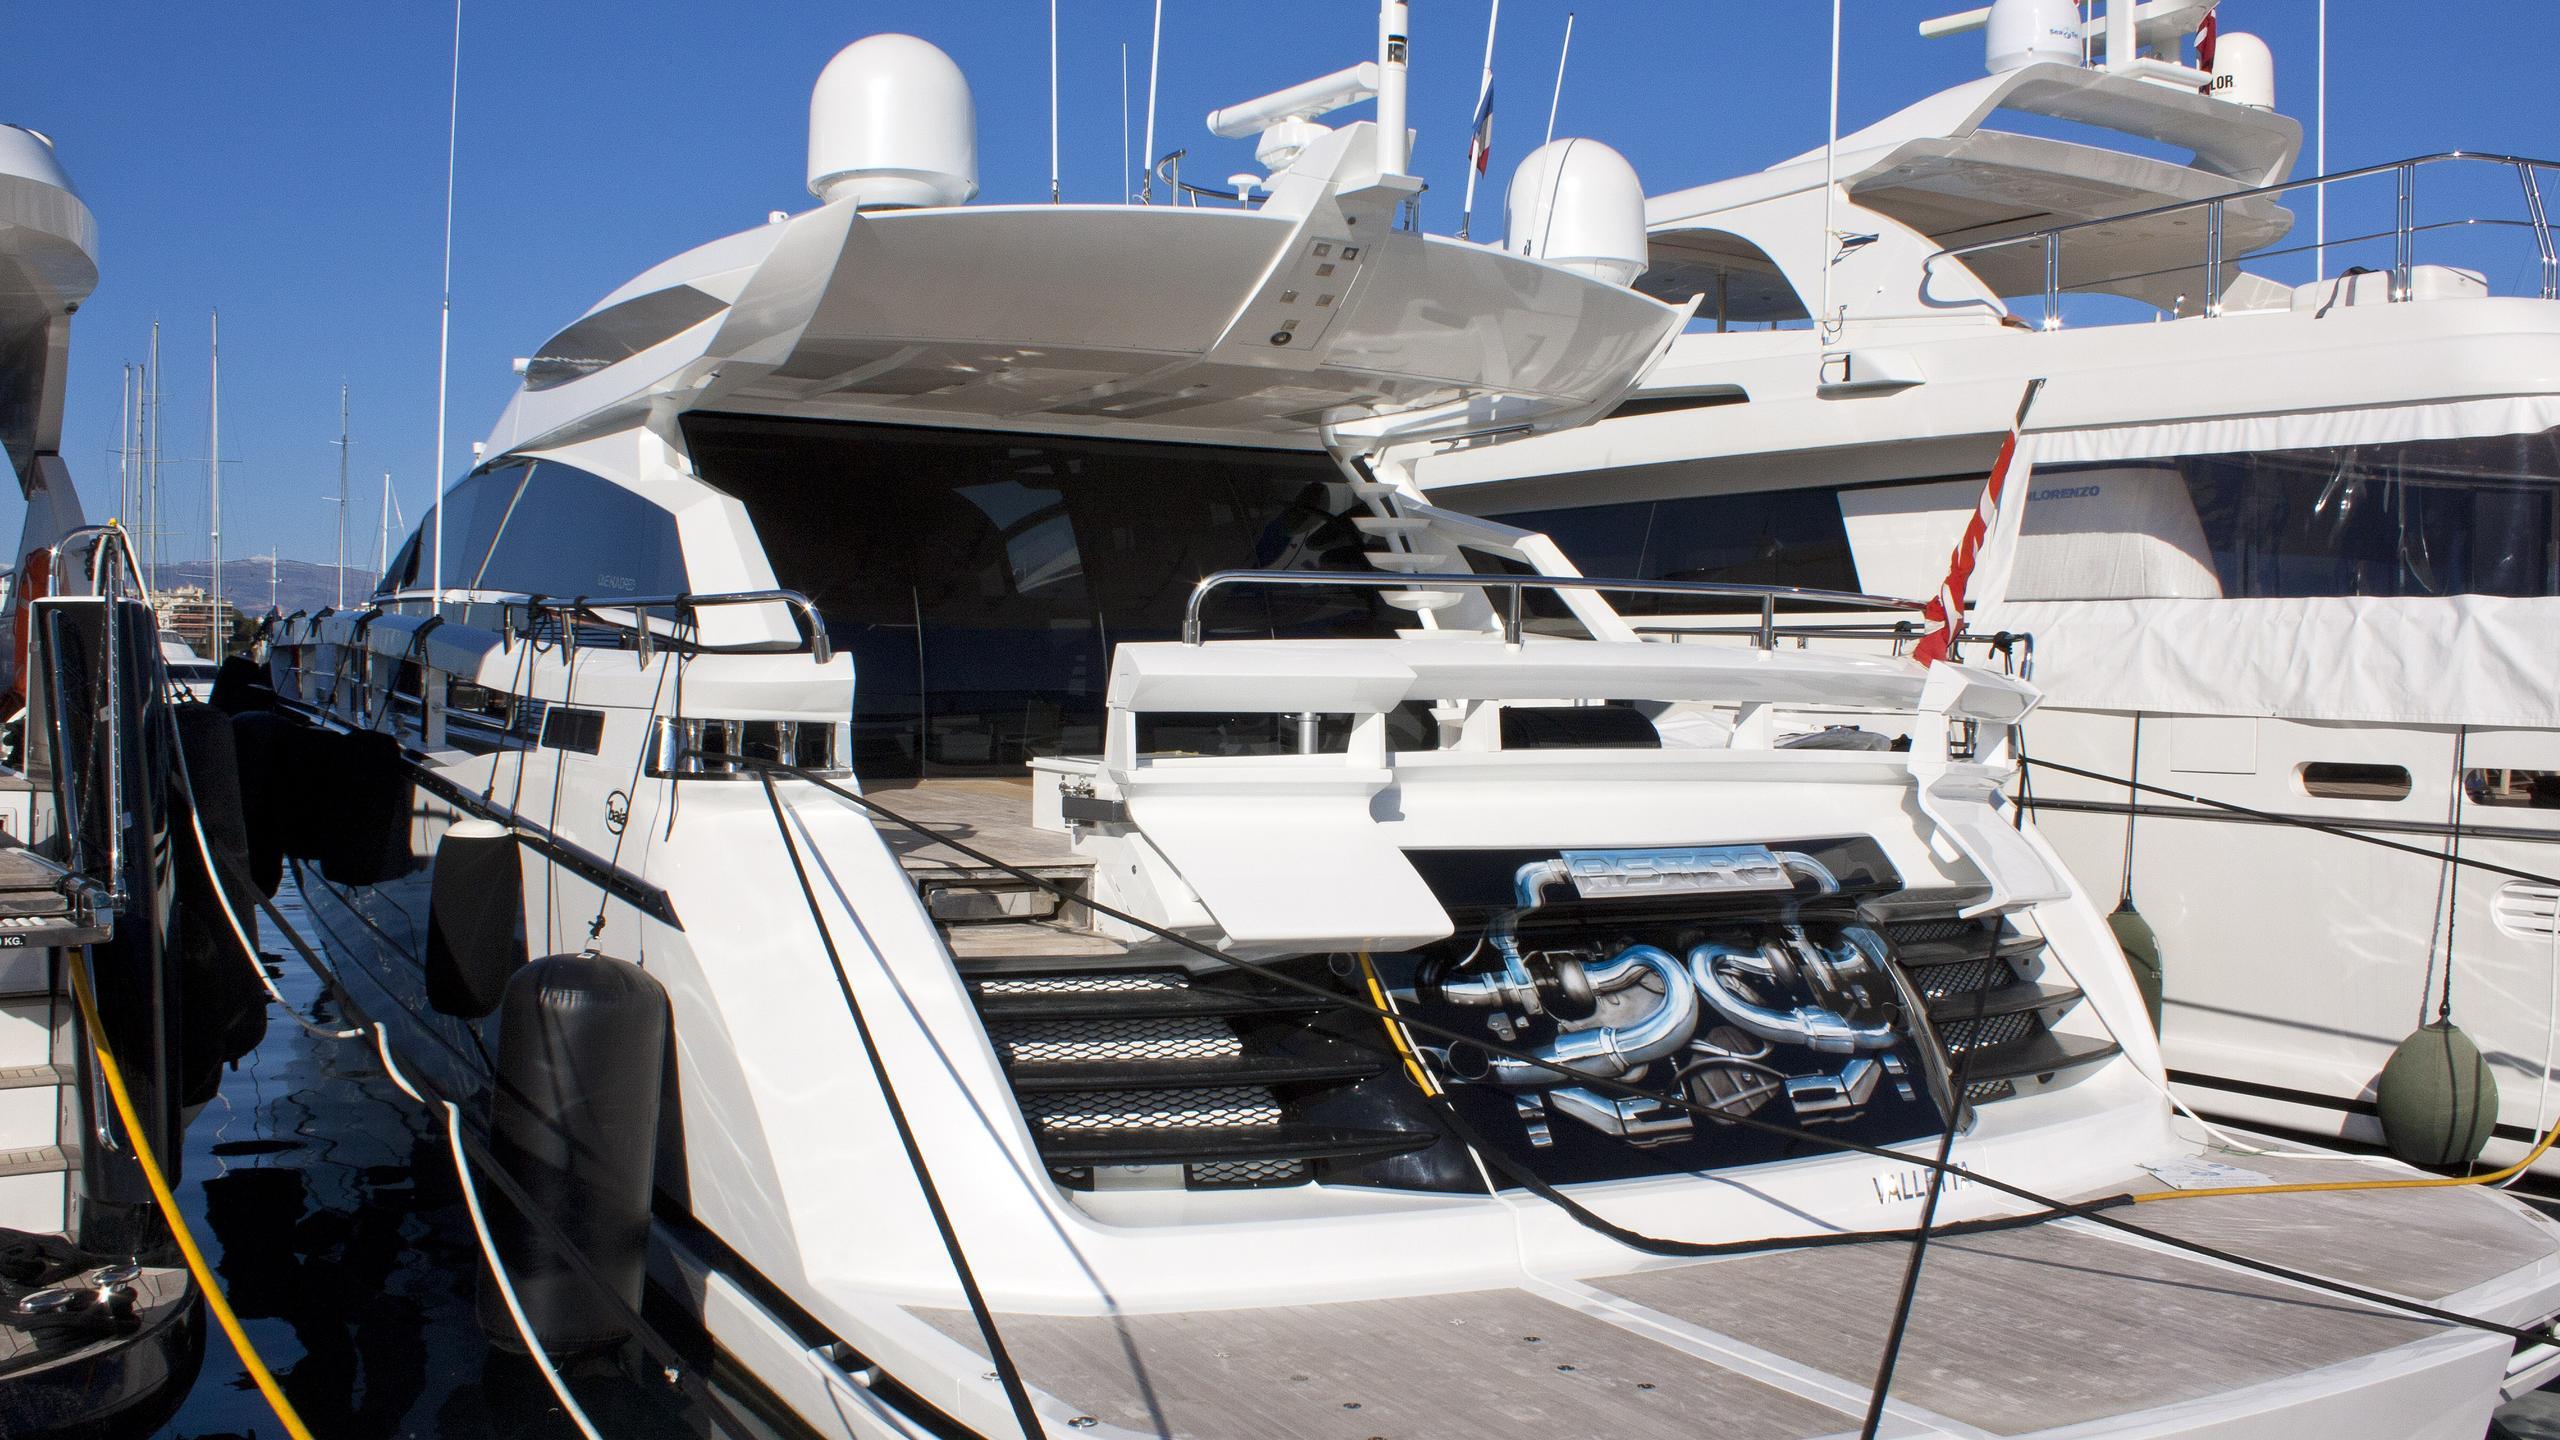 astro-motor-yacht-baia-one-hundred-2010-31m-stern